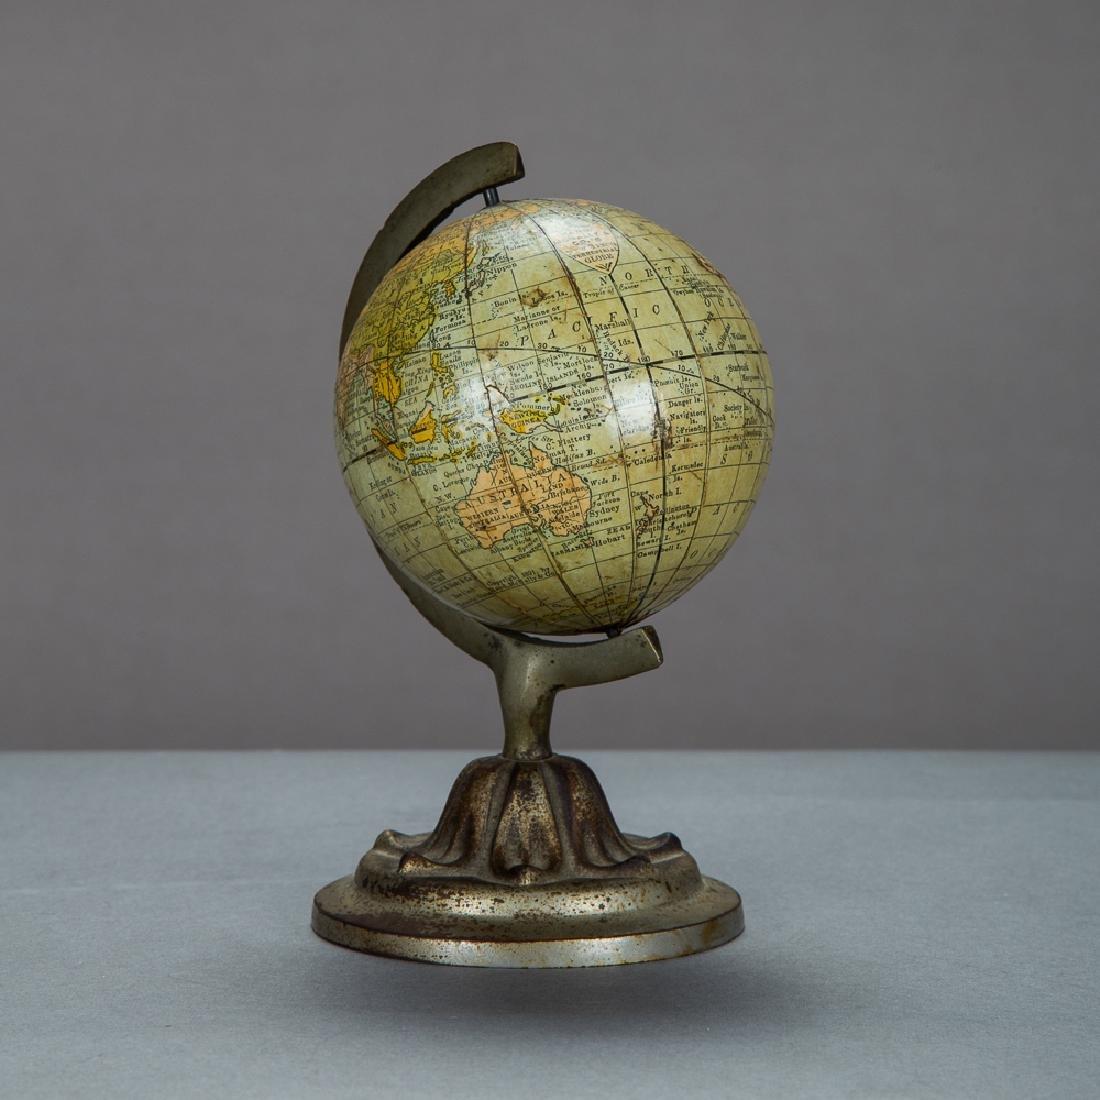 A Rand McNally 3-inch Terrestrial Globe by Rand McNally